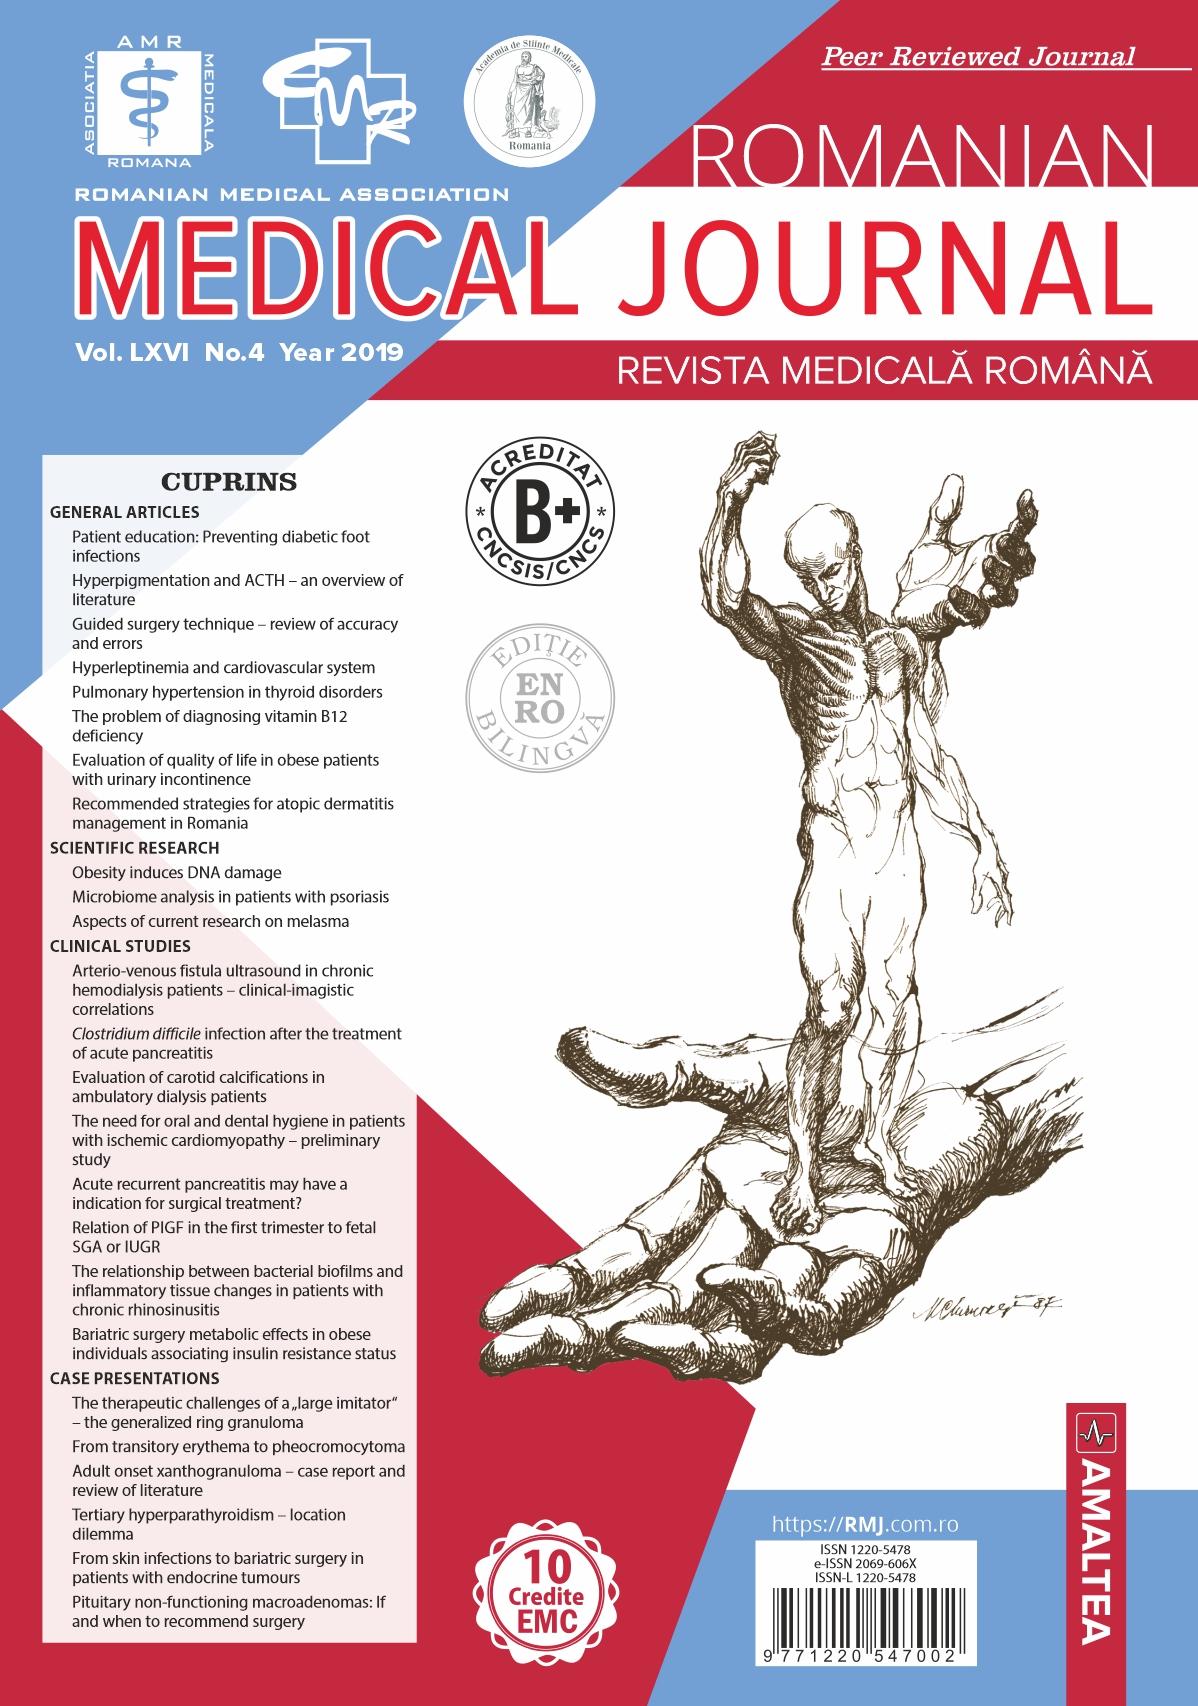 REVISTA MEDICALA ROMANA - Romanian Medical Journal, Vol. LXVI, No. 4, Year 2019